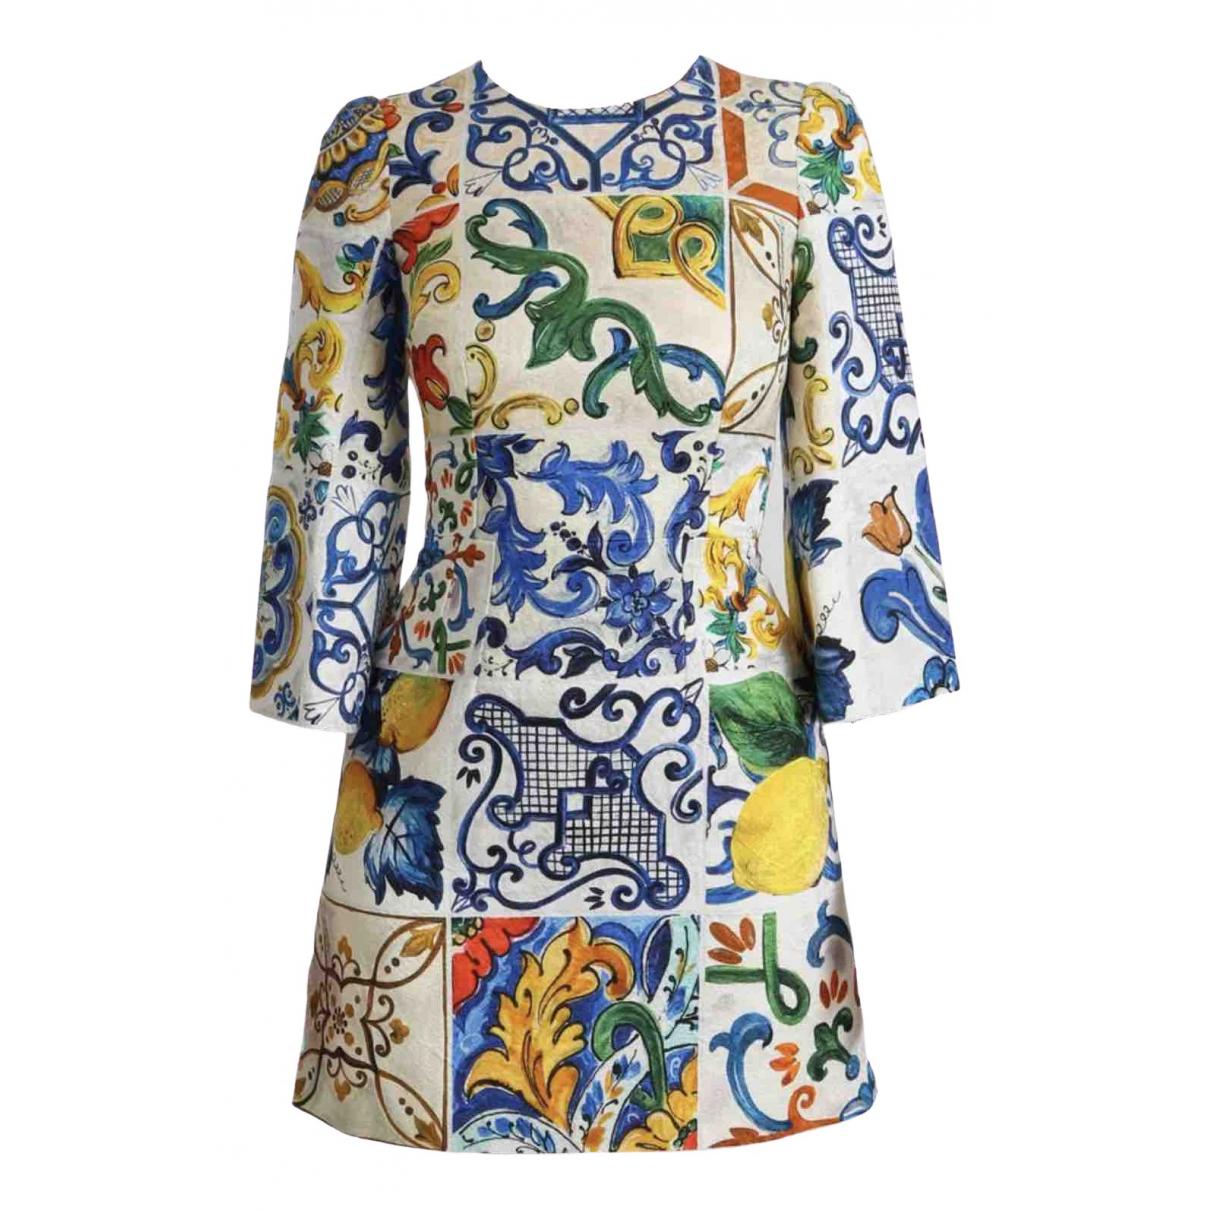 Dolce & Gabbana \N Multicolour Cotton dress for Women 38 IT